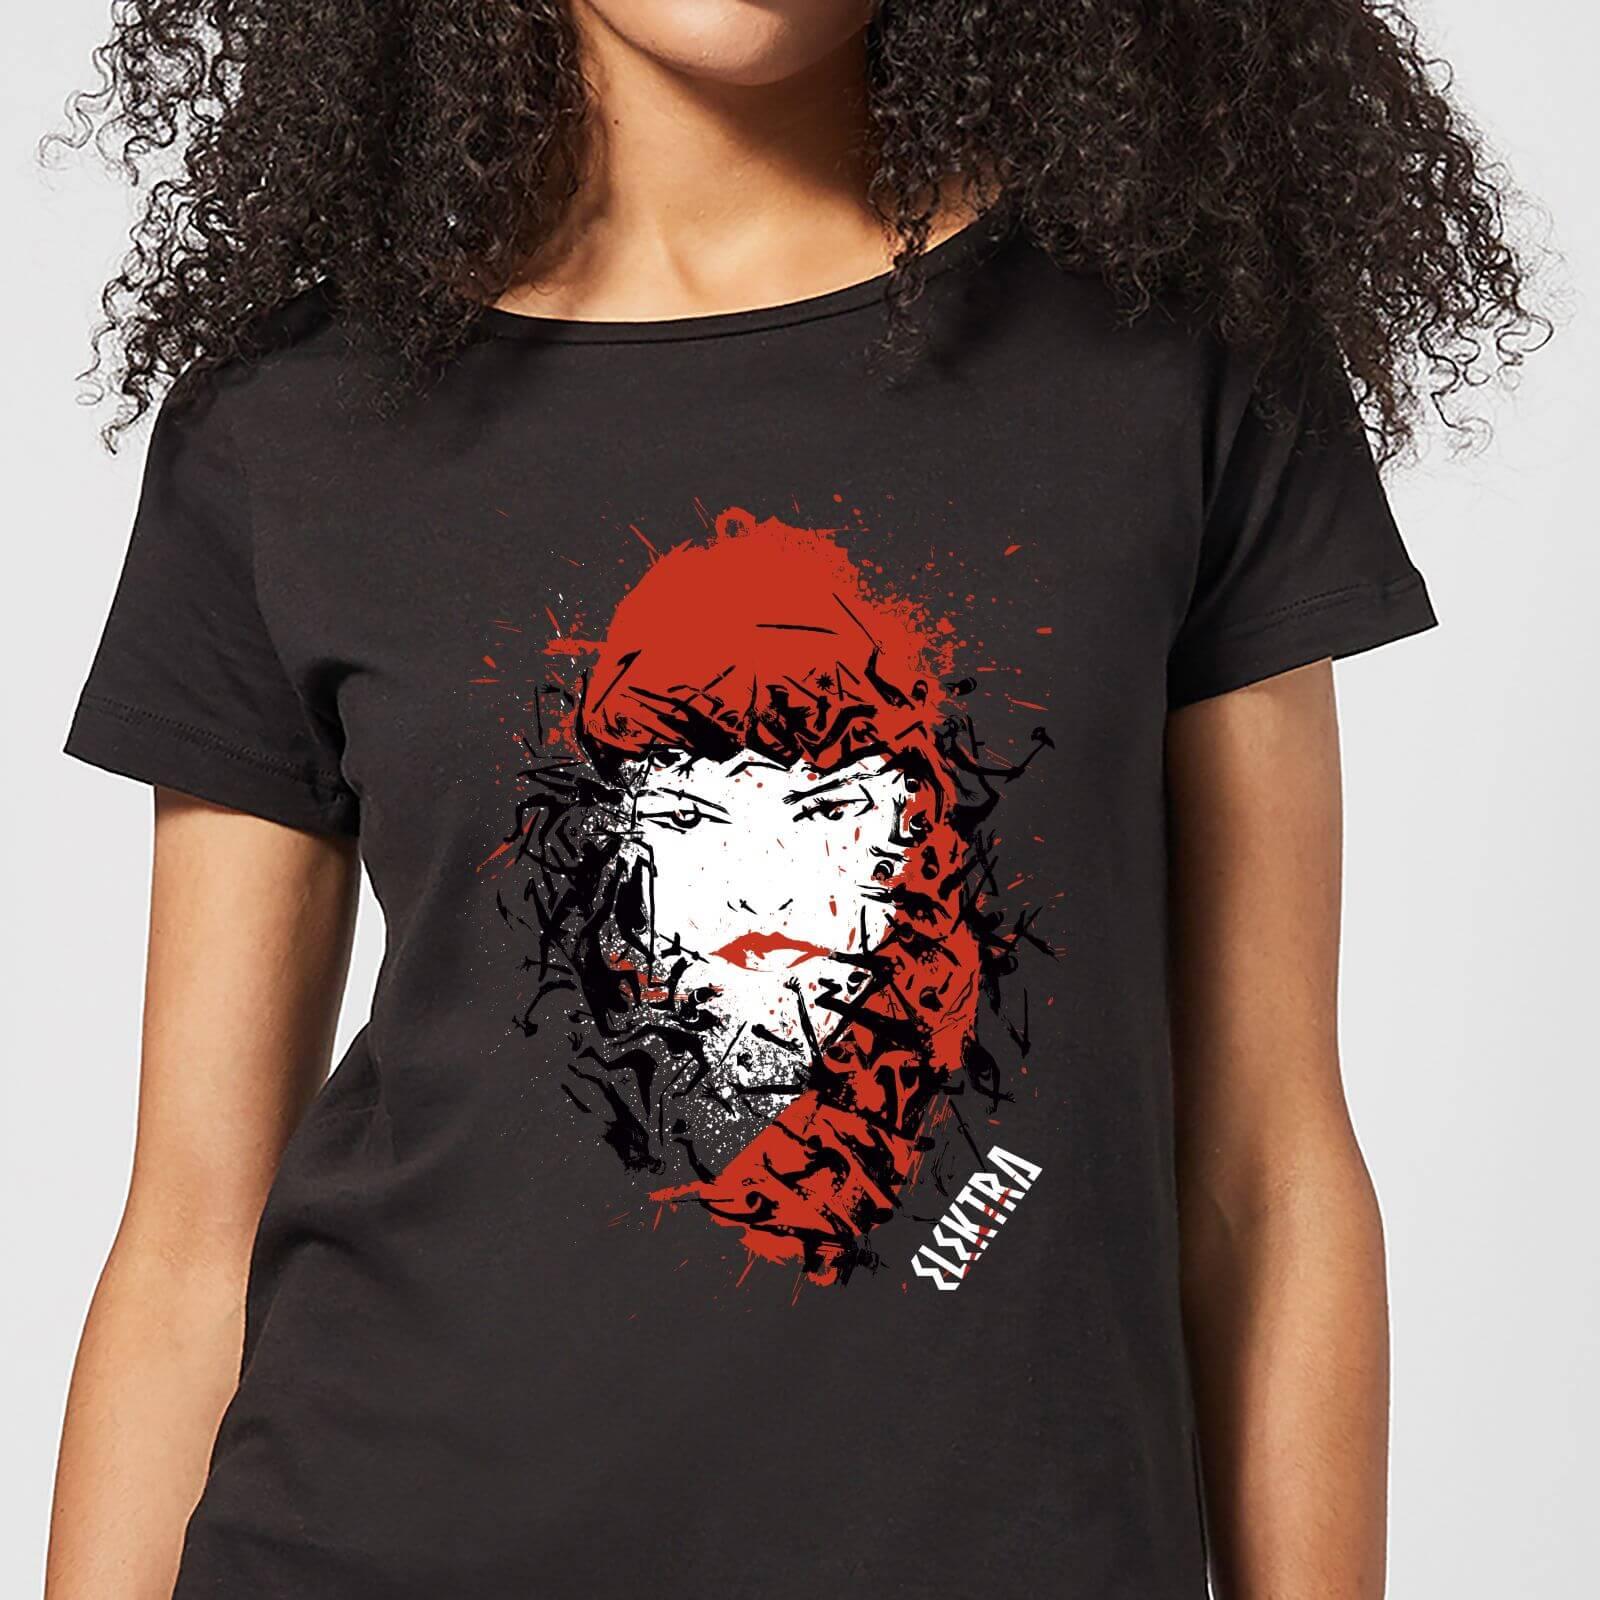 OfferteWeb.click 24-t-shirt-marvel-knights-elektra-face-of-death-nero-donna